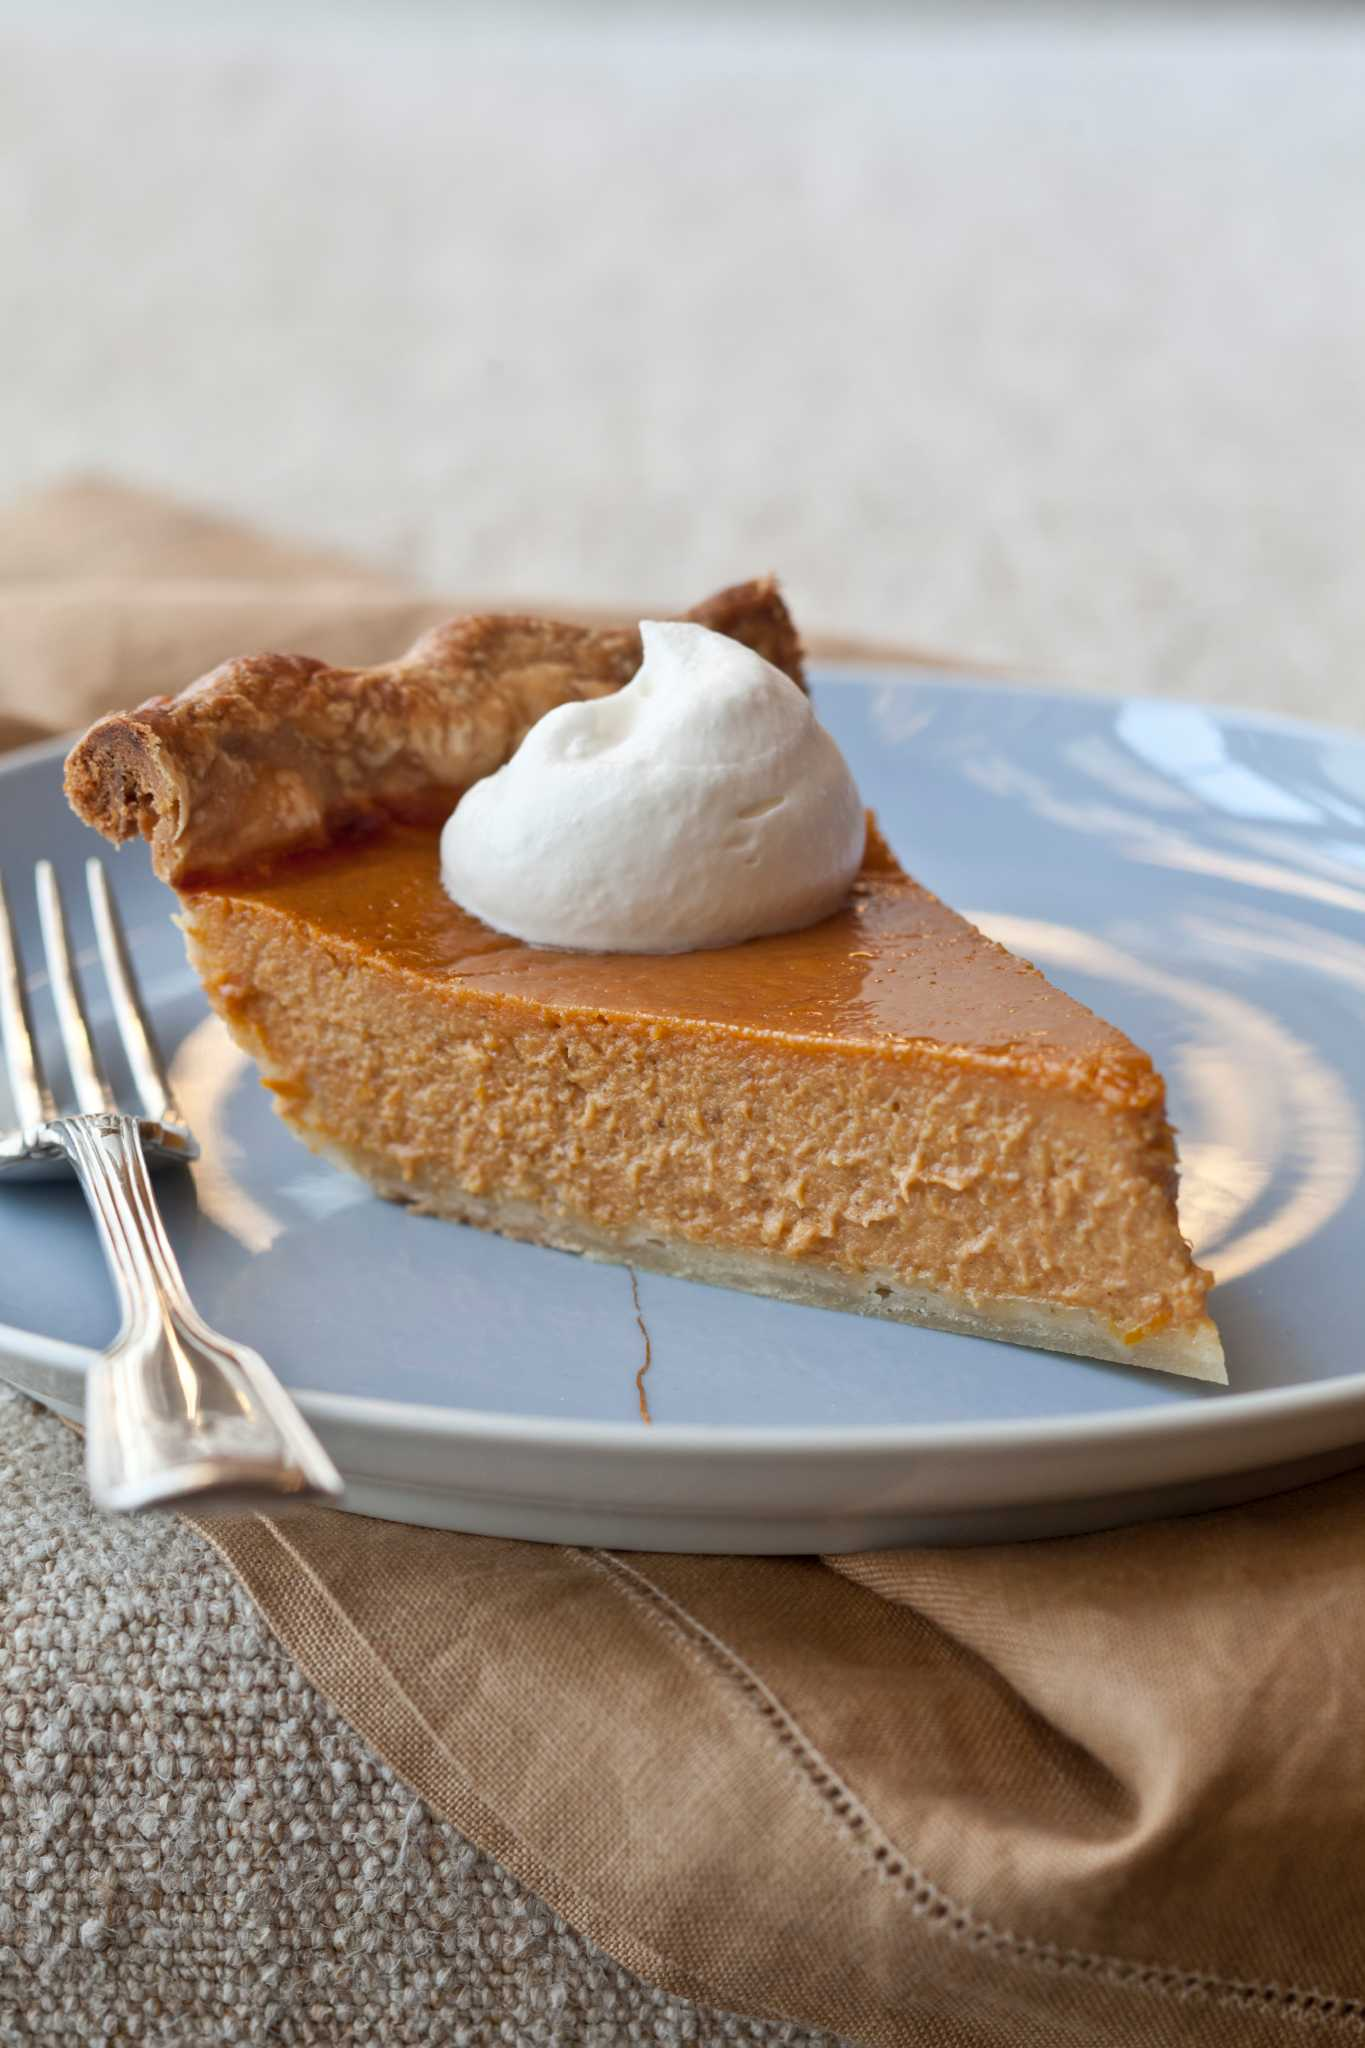 Ina Garten Pumpkin Pie Ina Garten's Ultimate Pumpkin Pie With Rum Whipped Cream  Houston